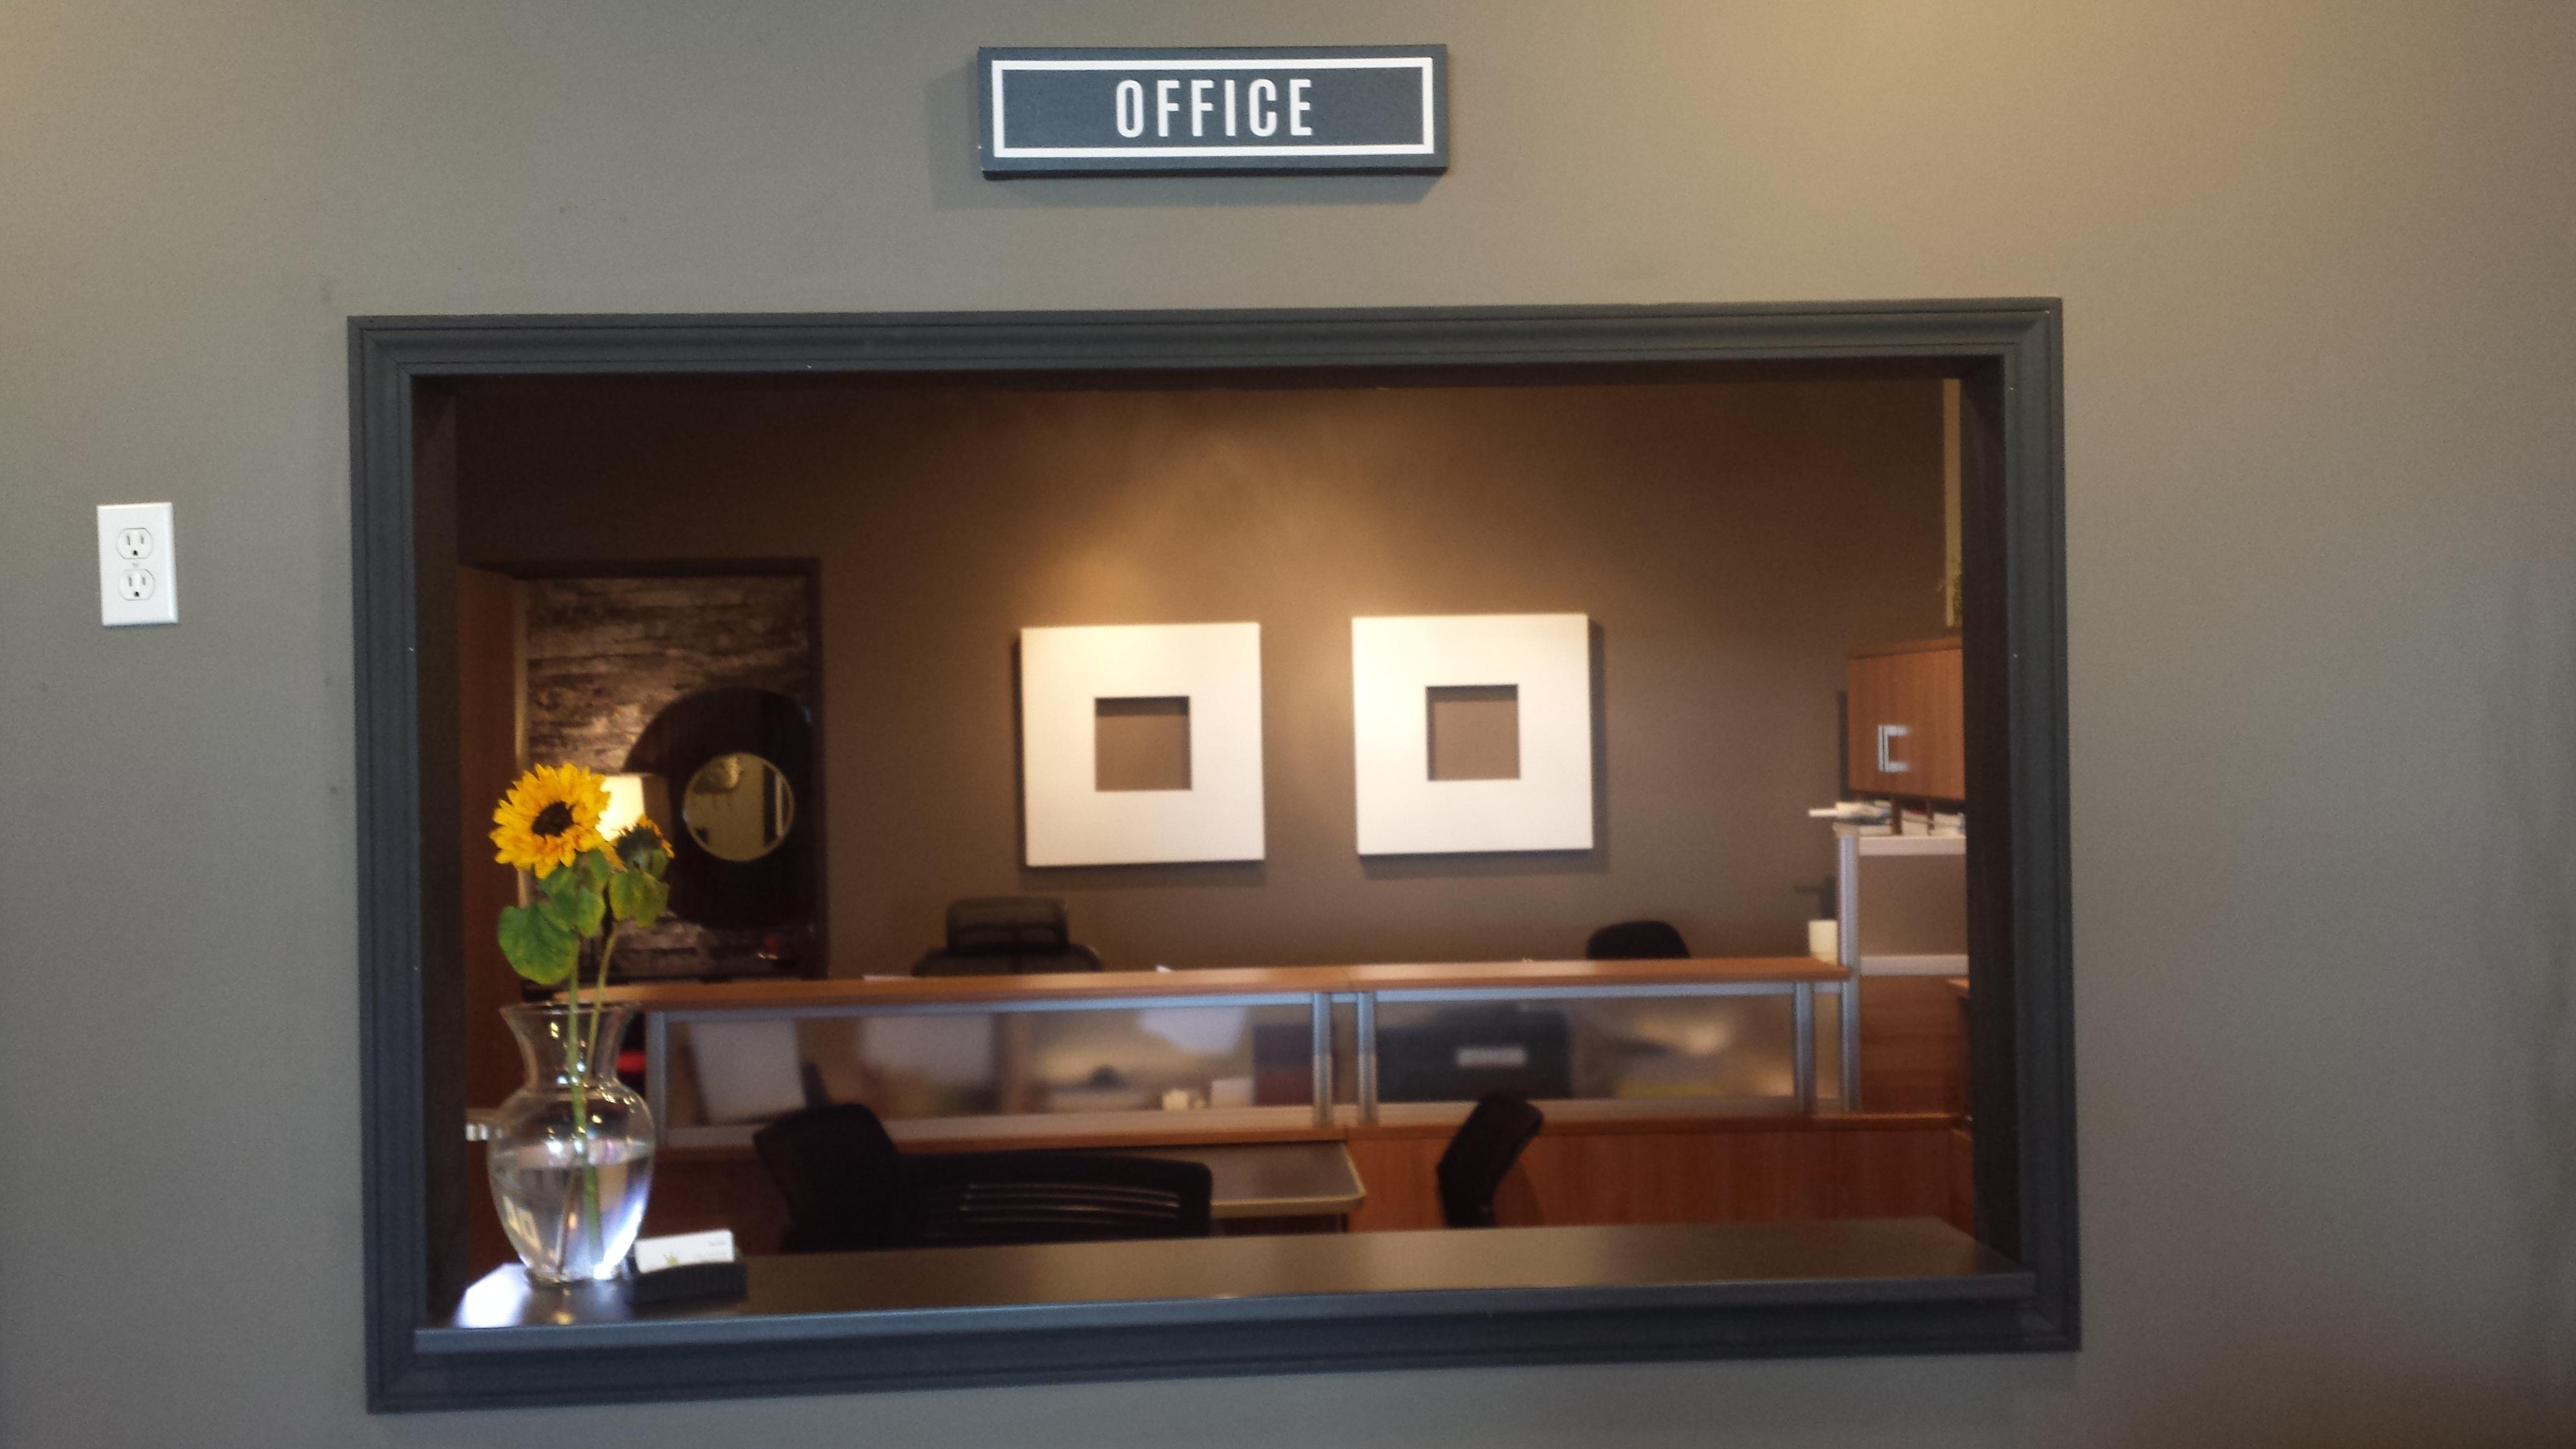 Crown fice Furniture Tulsa Oklahoma